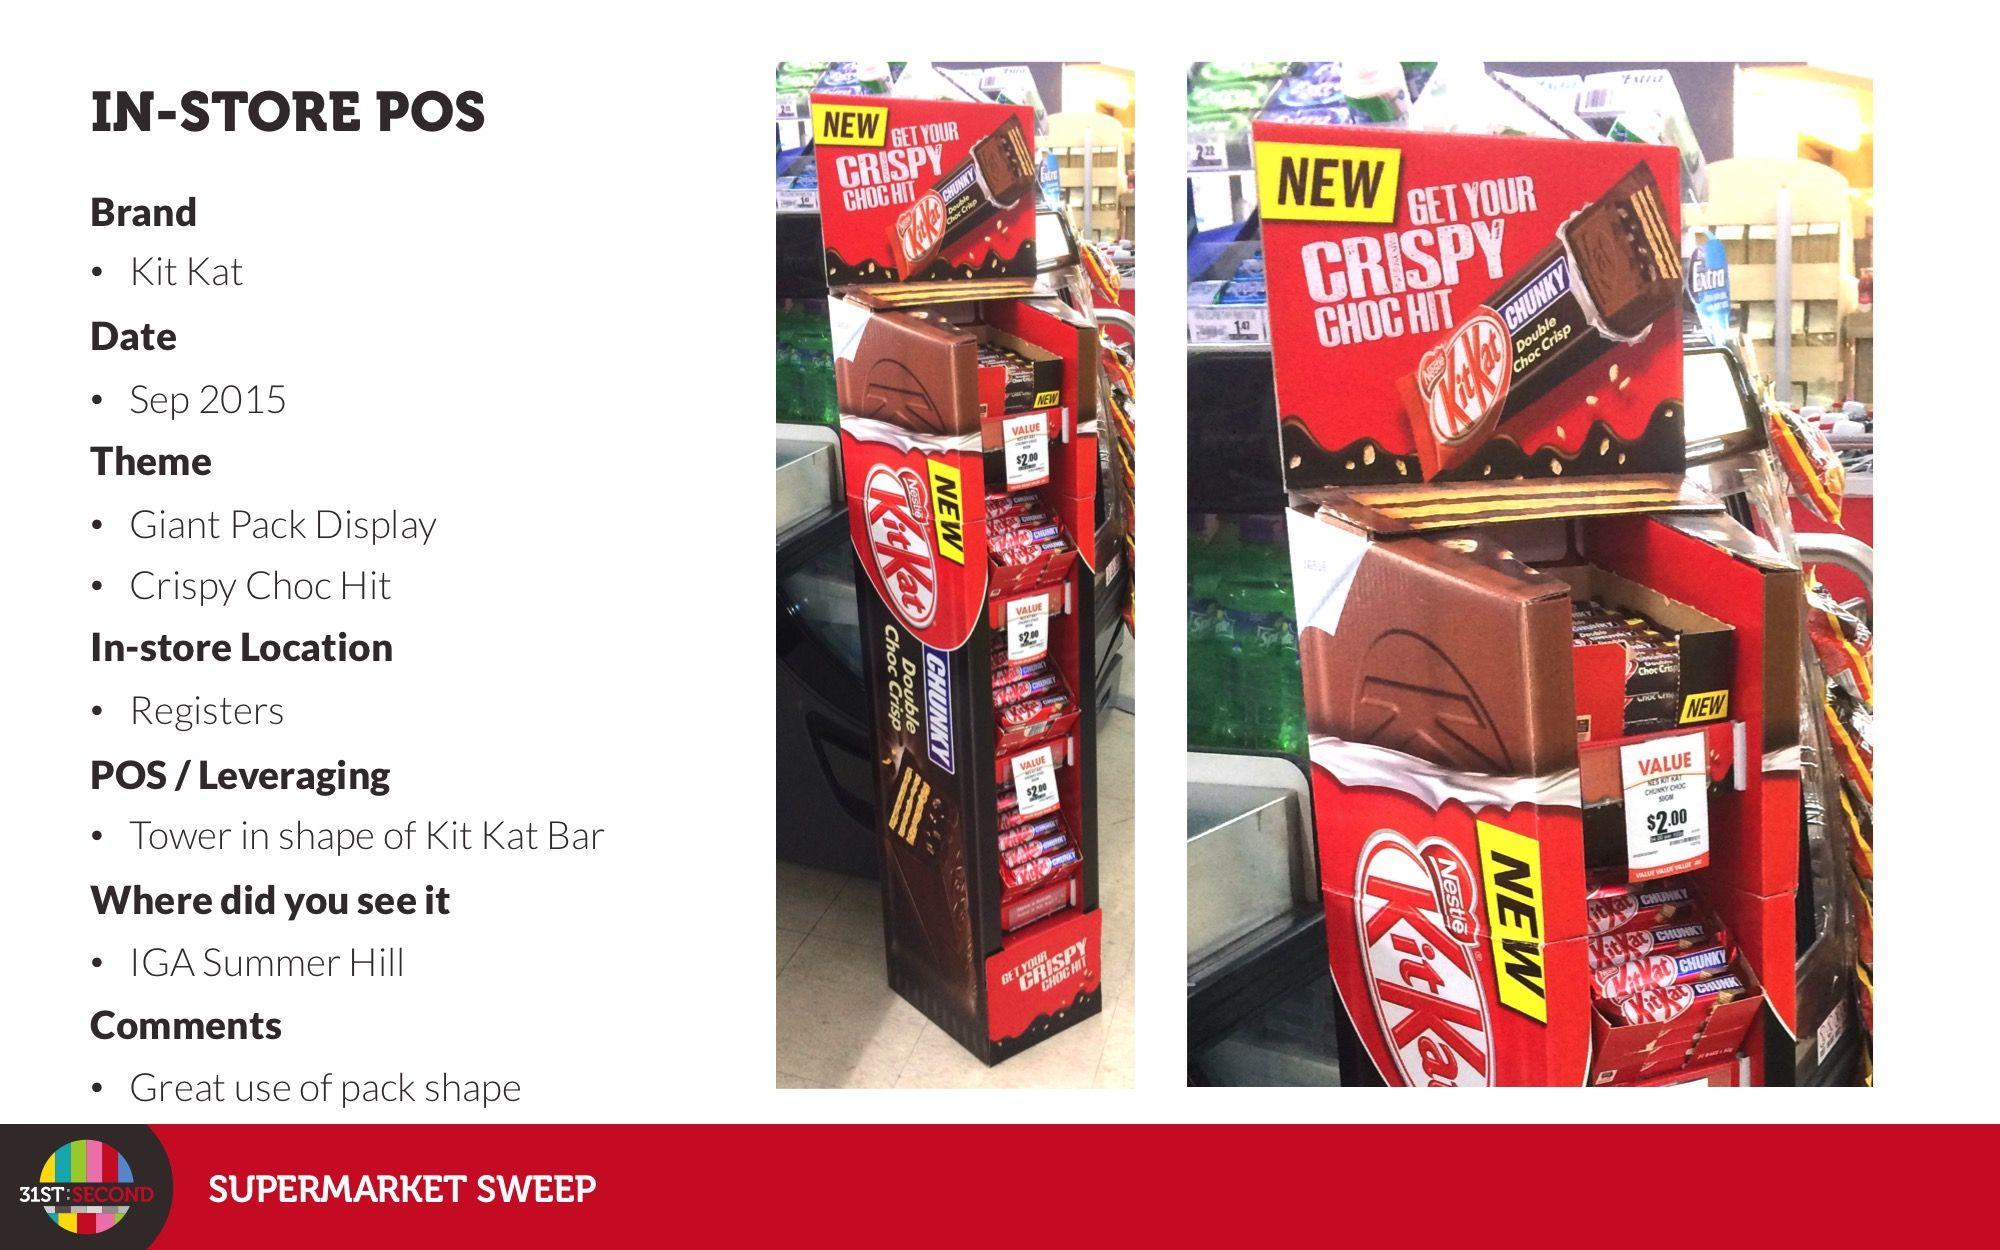 KitKat #Sep2015 #OffLocationDisplay #GiantPack #Tower #IGA